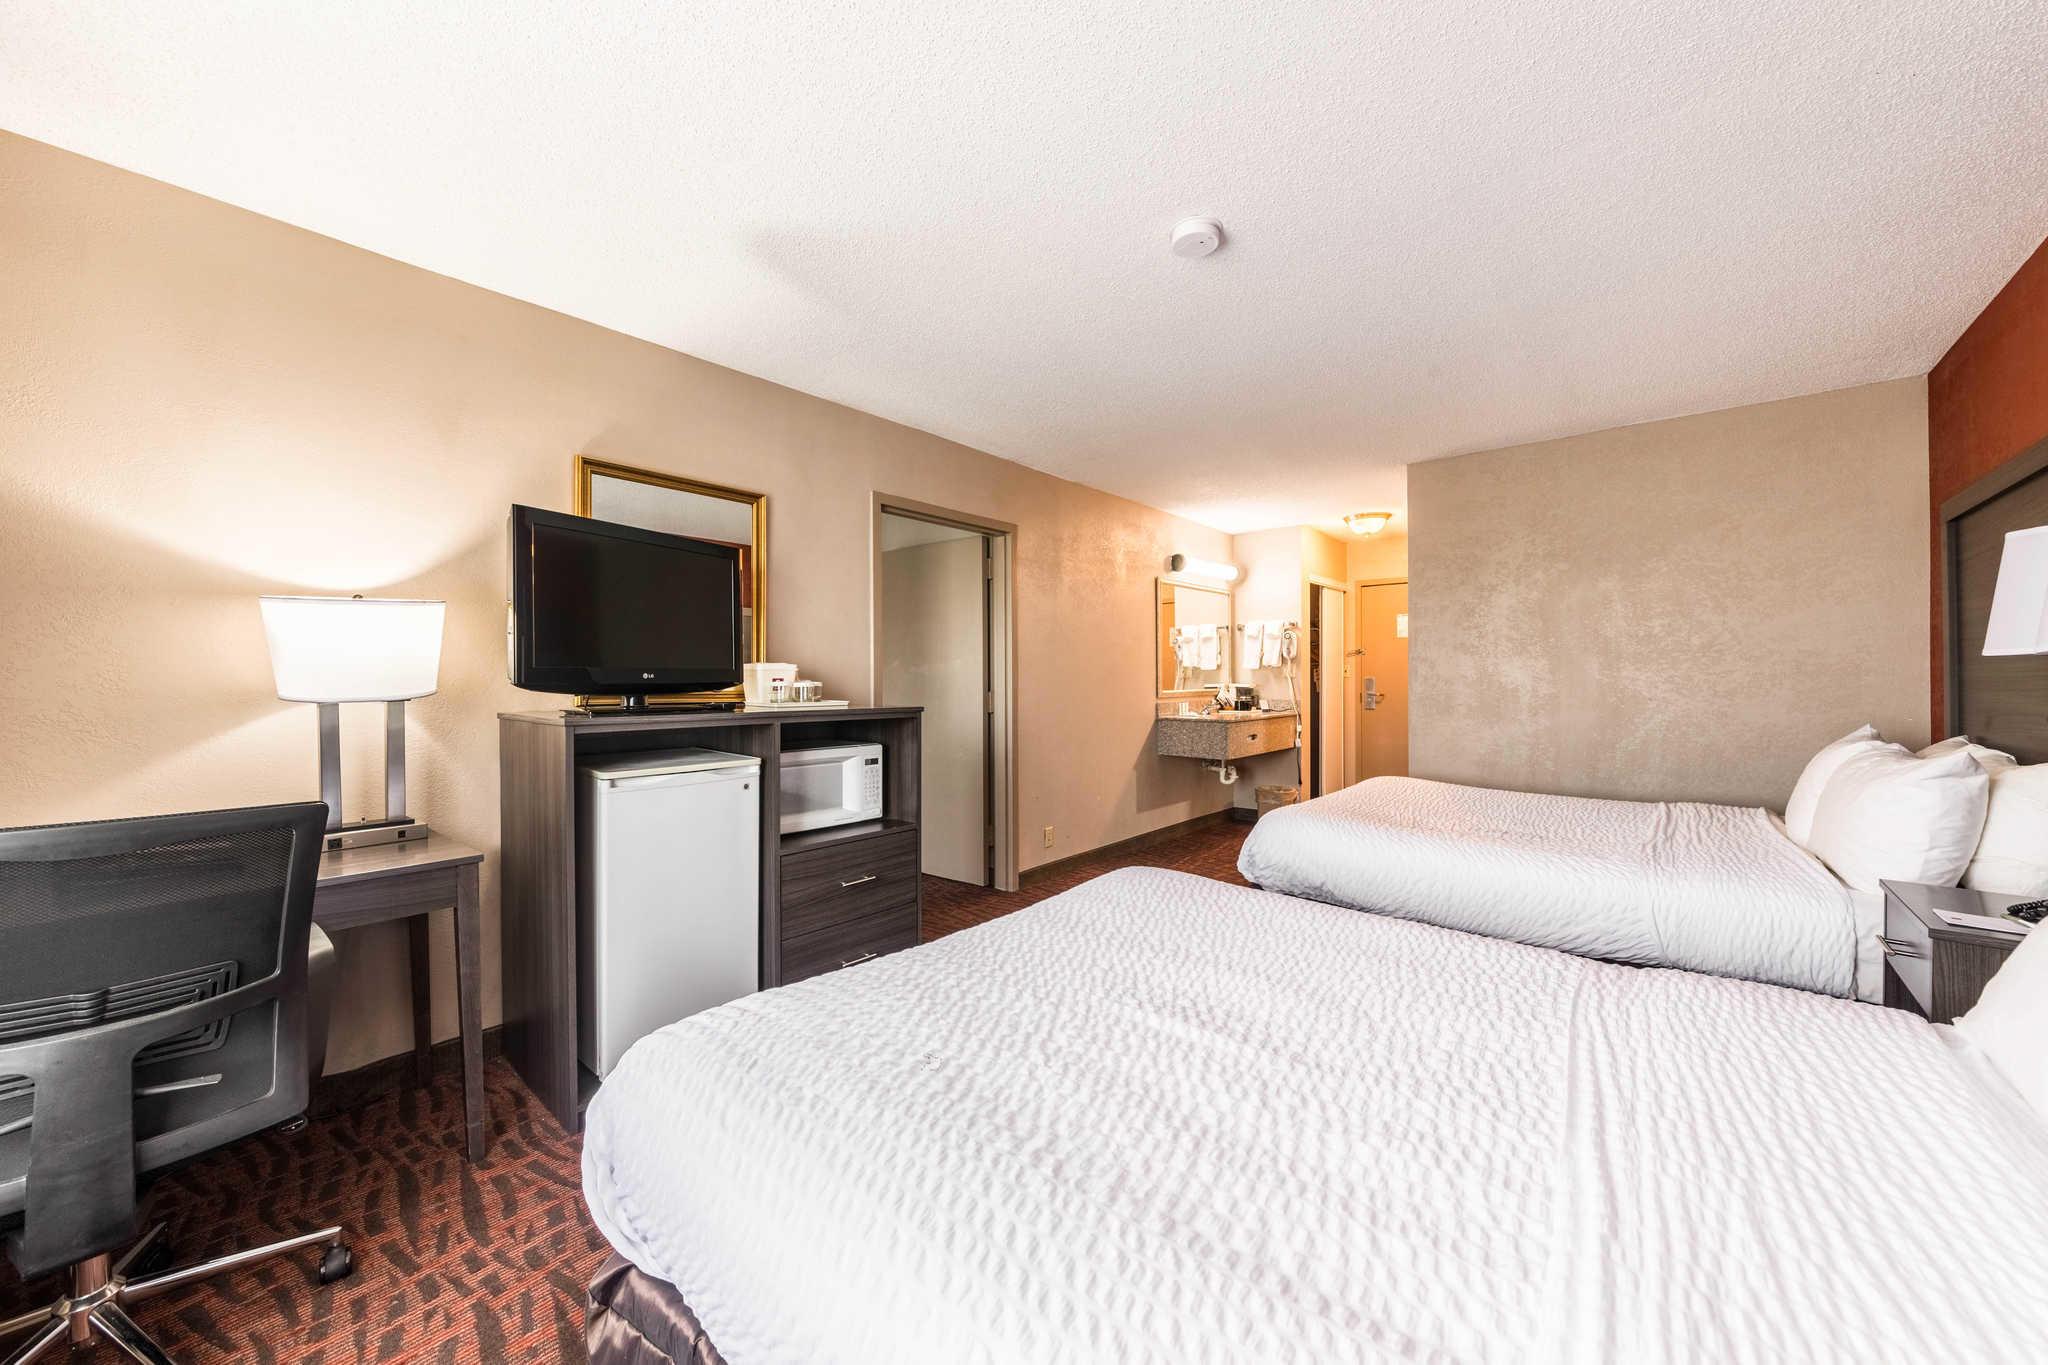 Clarion Inn & Suites image 33